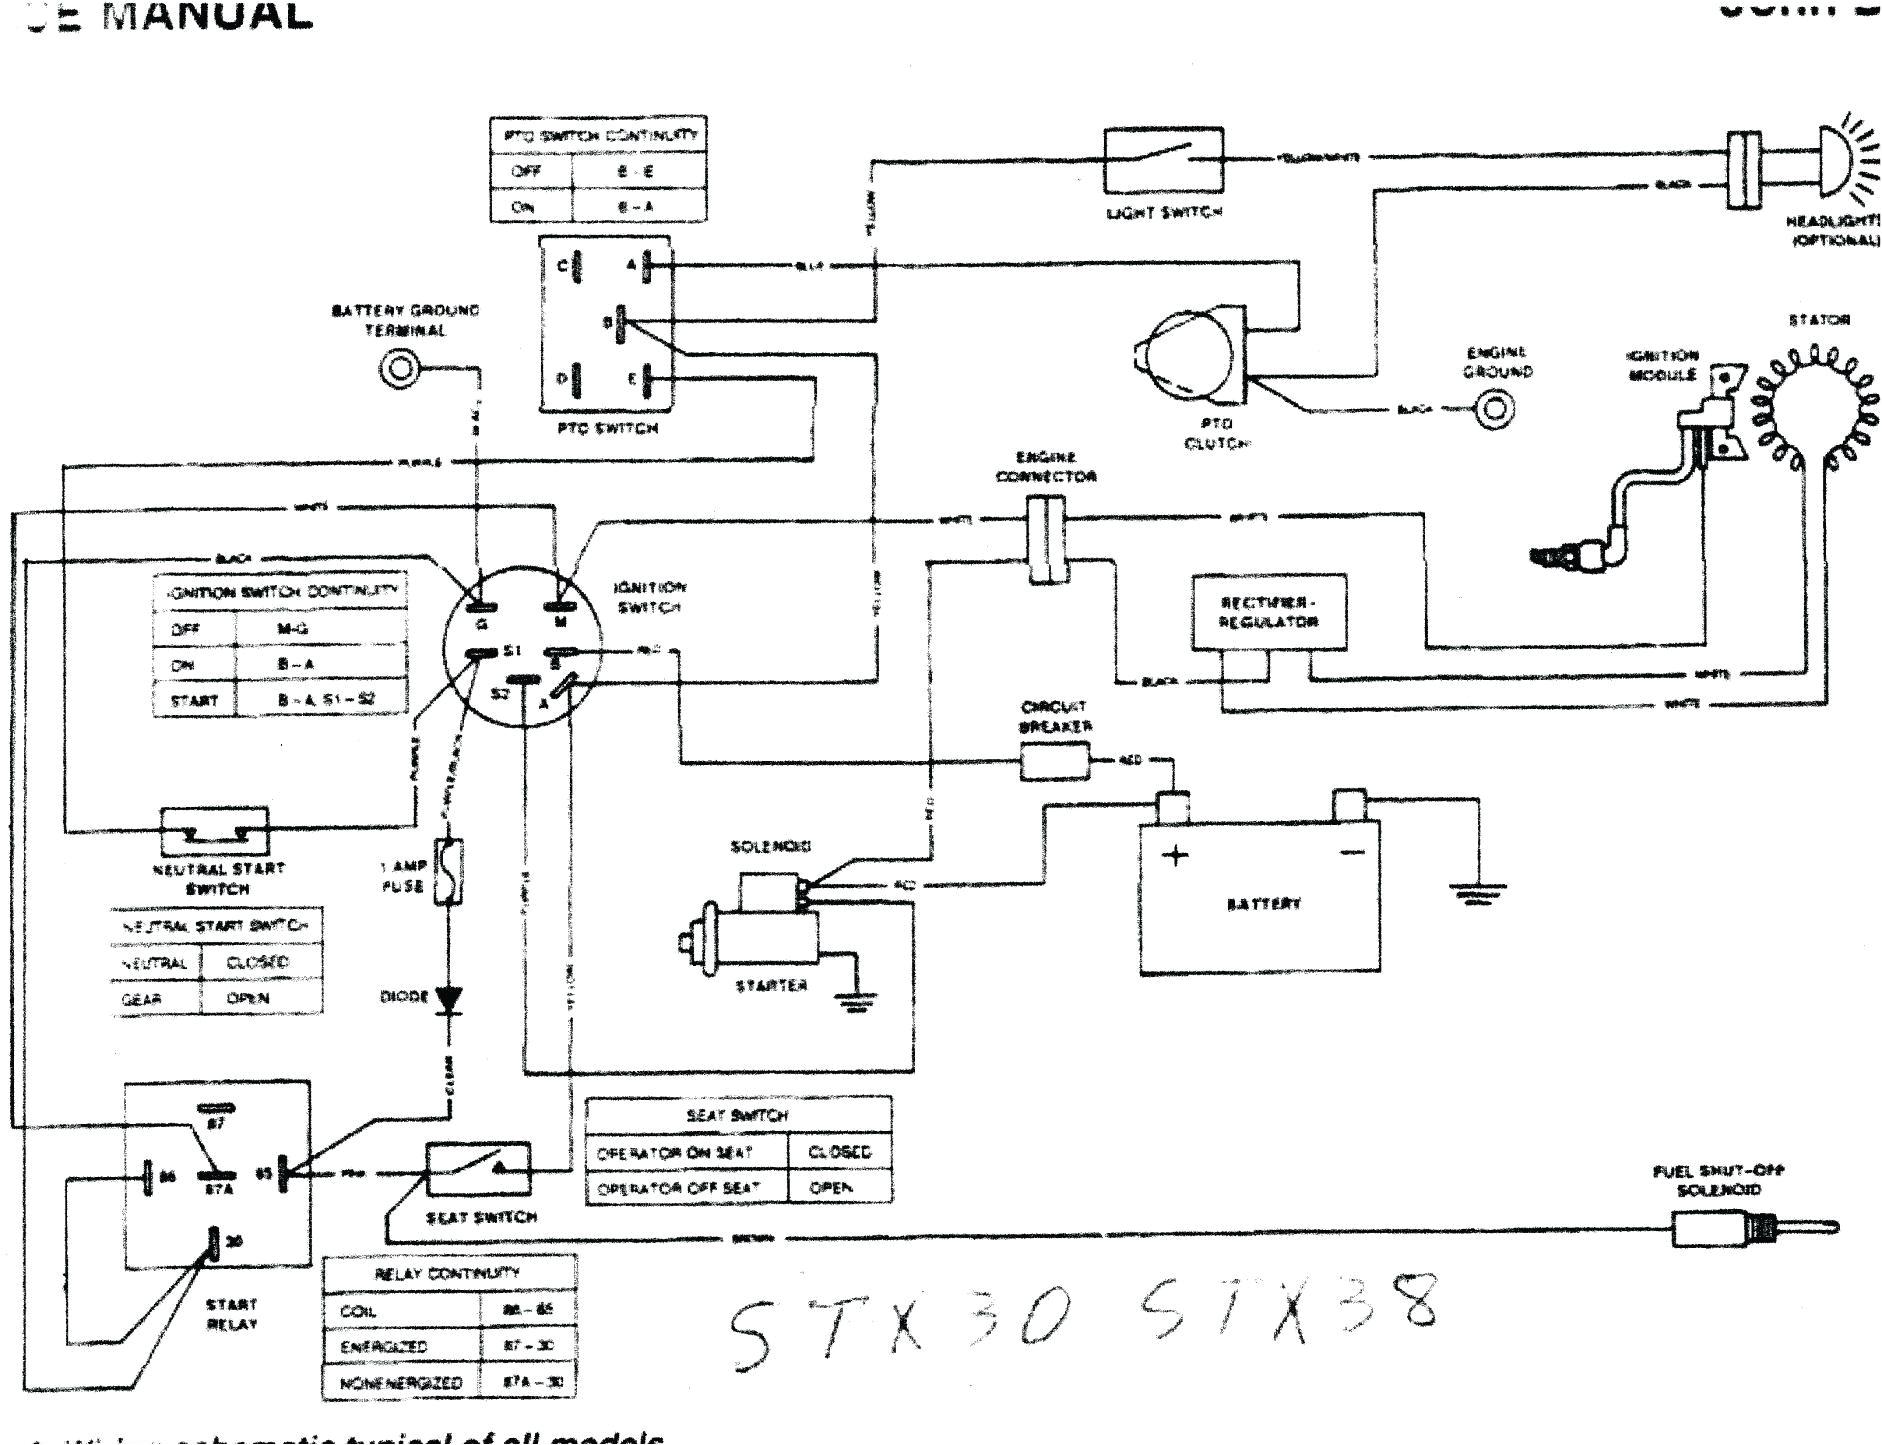 john deere 4100 wiring schematic lukaszmira com at diagram 5b1dbf99dd3d3 gator 4 all 214